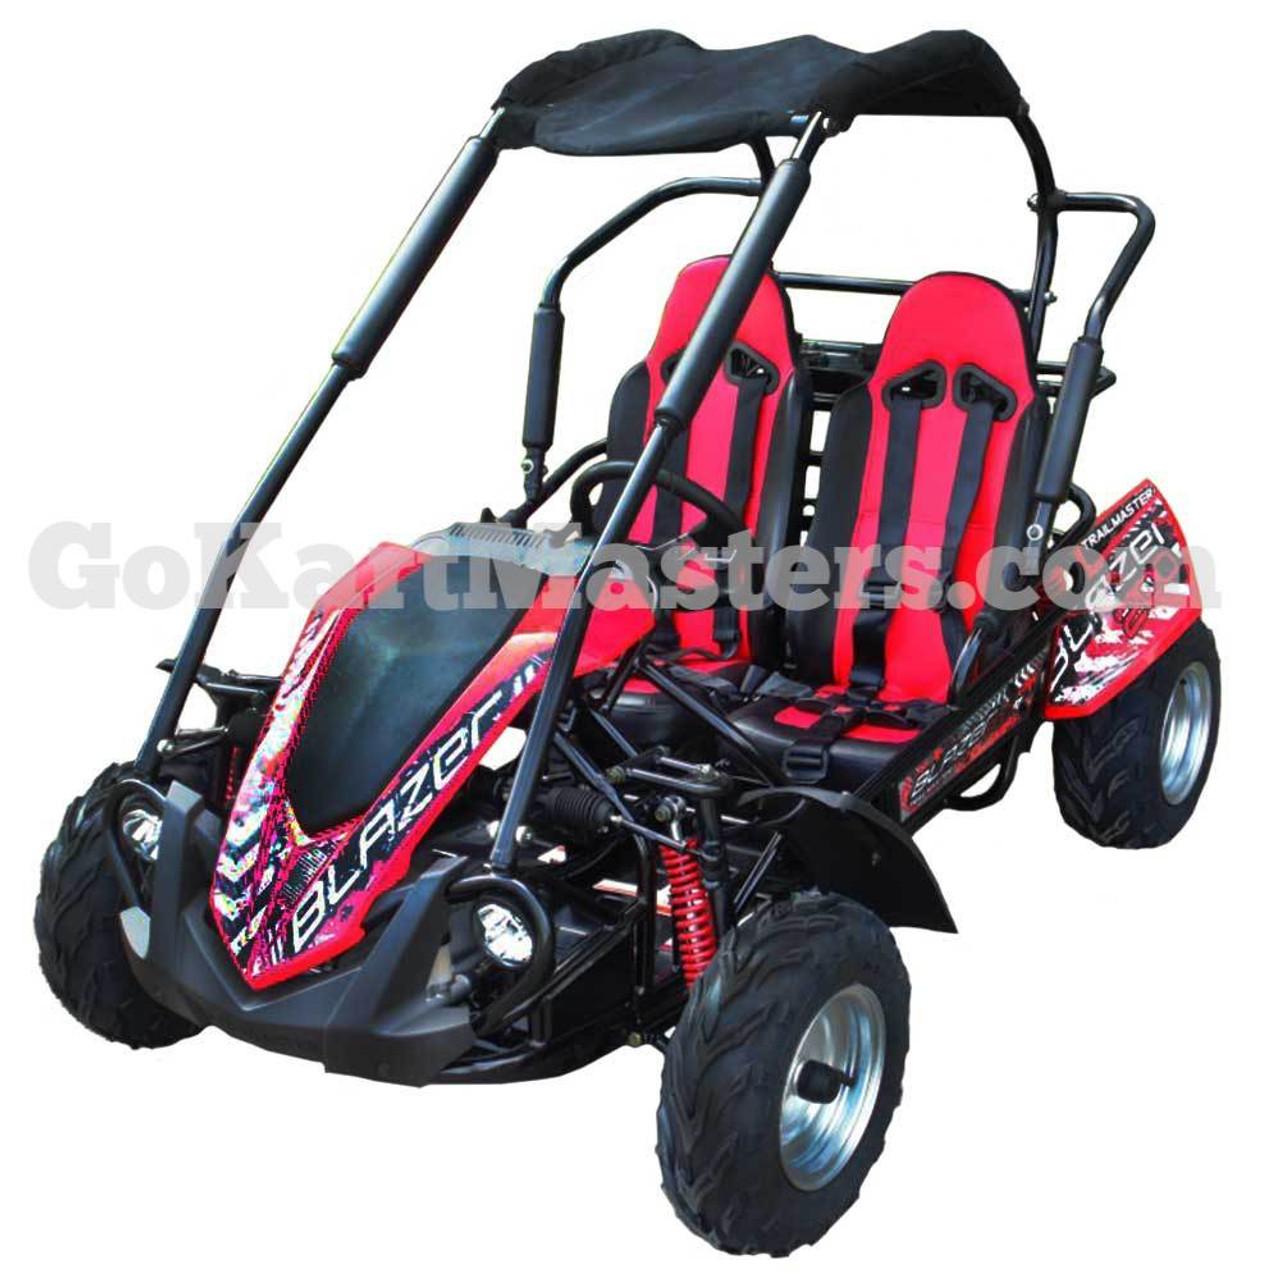 TrailMaster Blazer 200R Go Kart w/ Reverse - Red